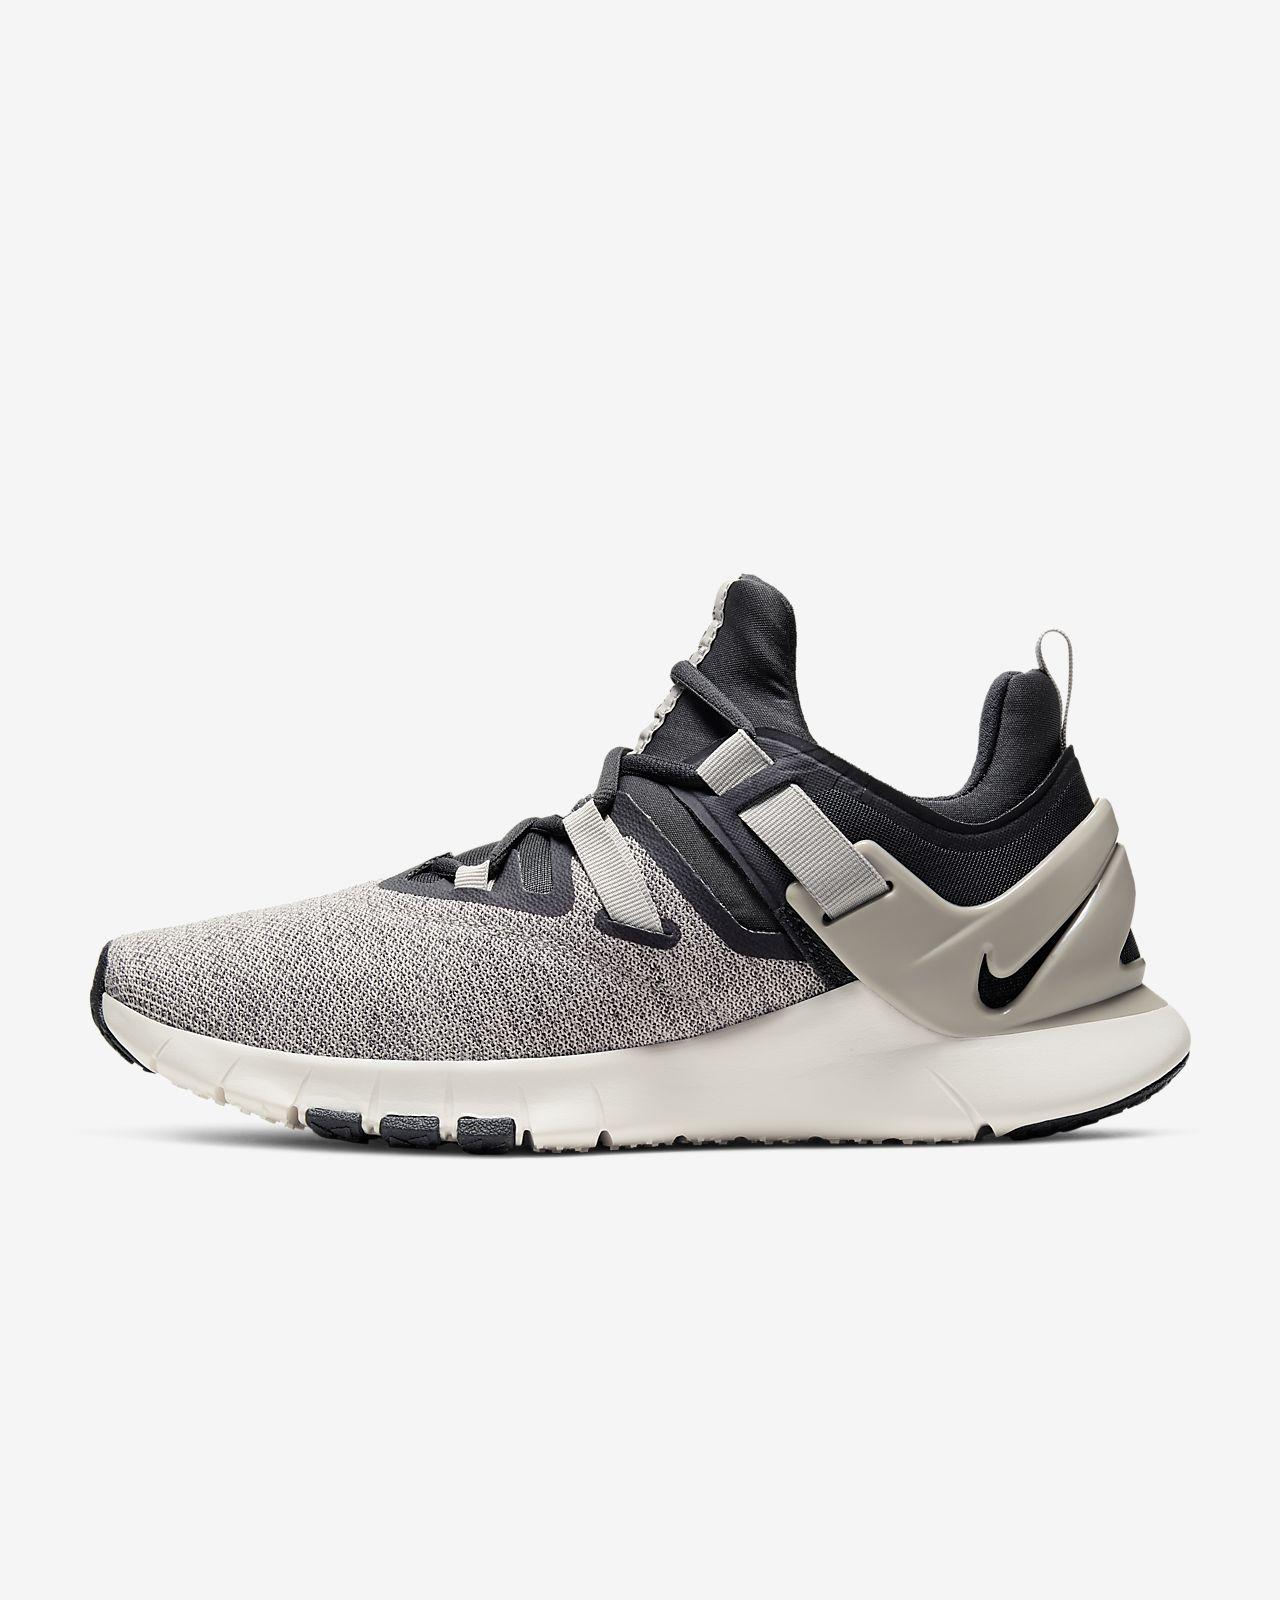 Calzado de entrenamiento para hombre Nike Flexmethod TR